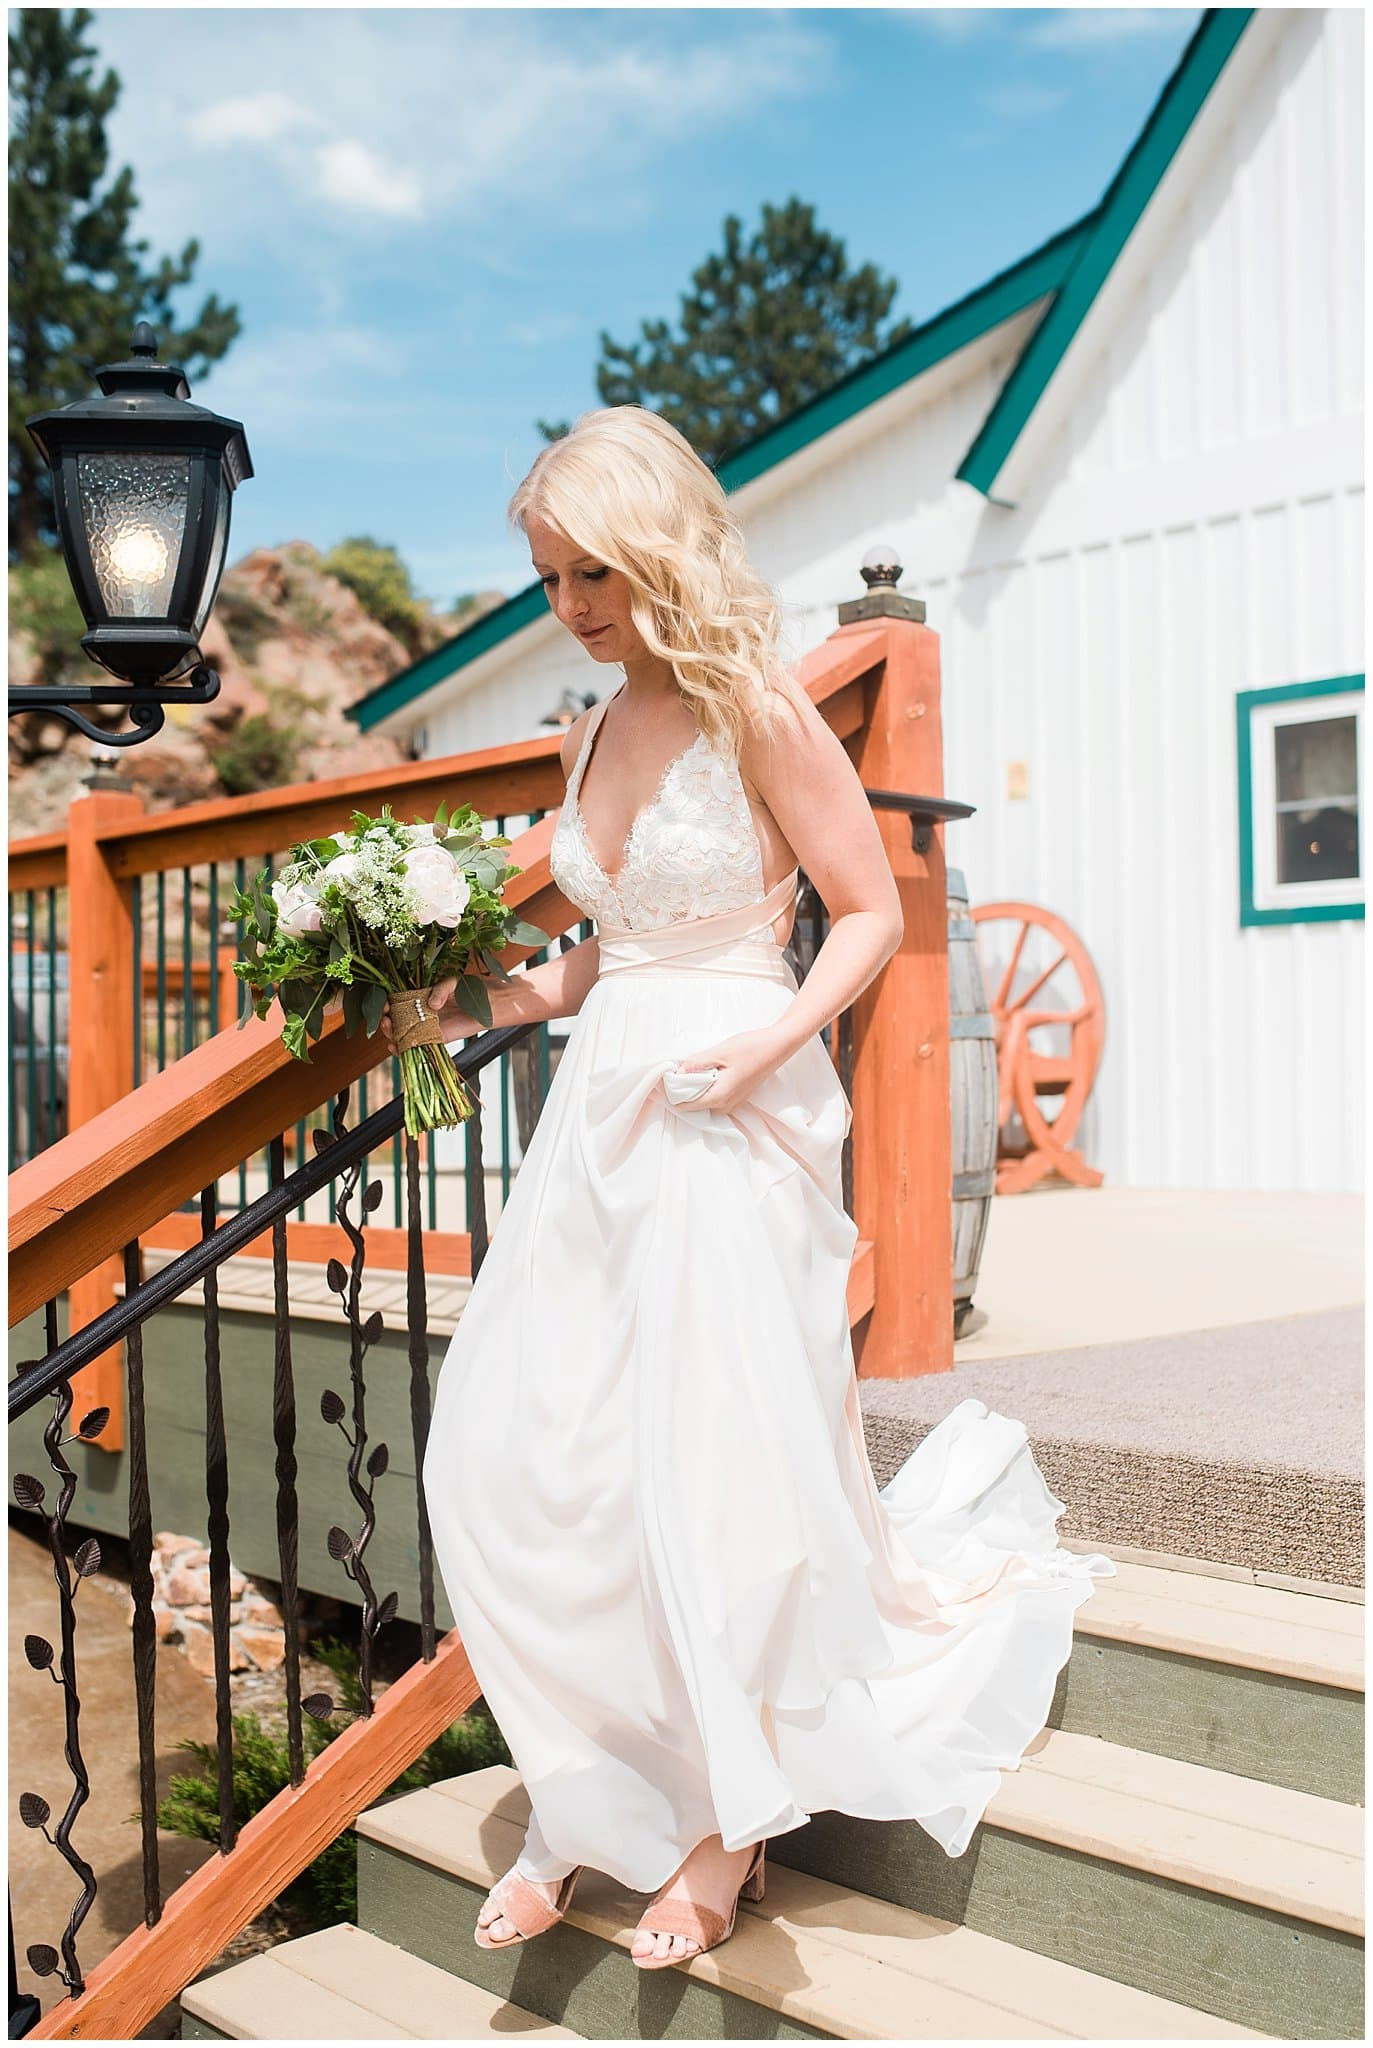 Truvelle Carrall Wedding Dress at Deer Creek Valley Ranch wedding by Deer Creek Valley Ranch Wedding Photographer Jennie Crate Photographer